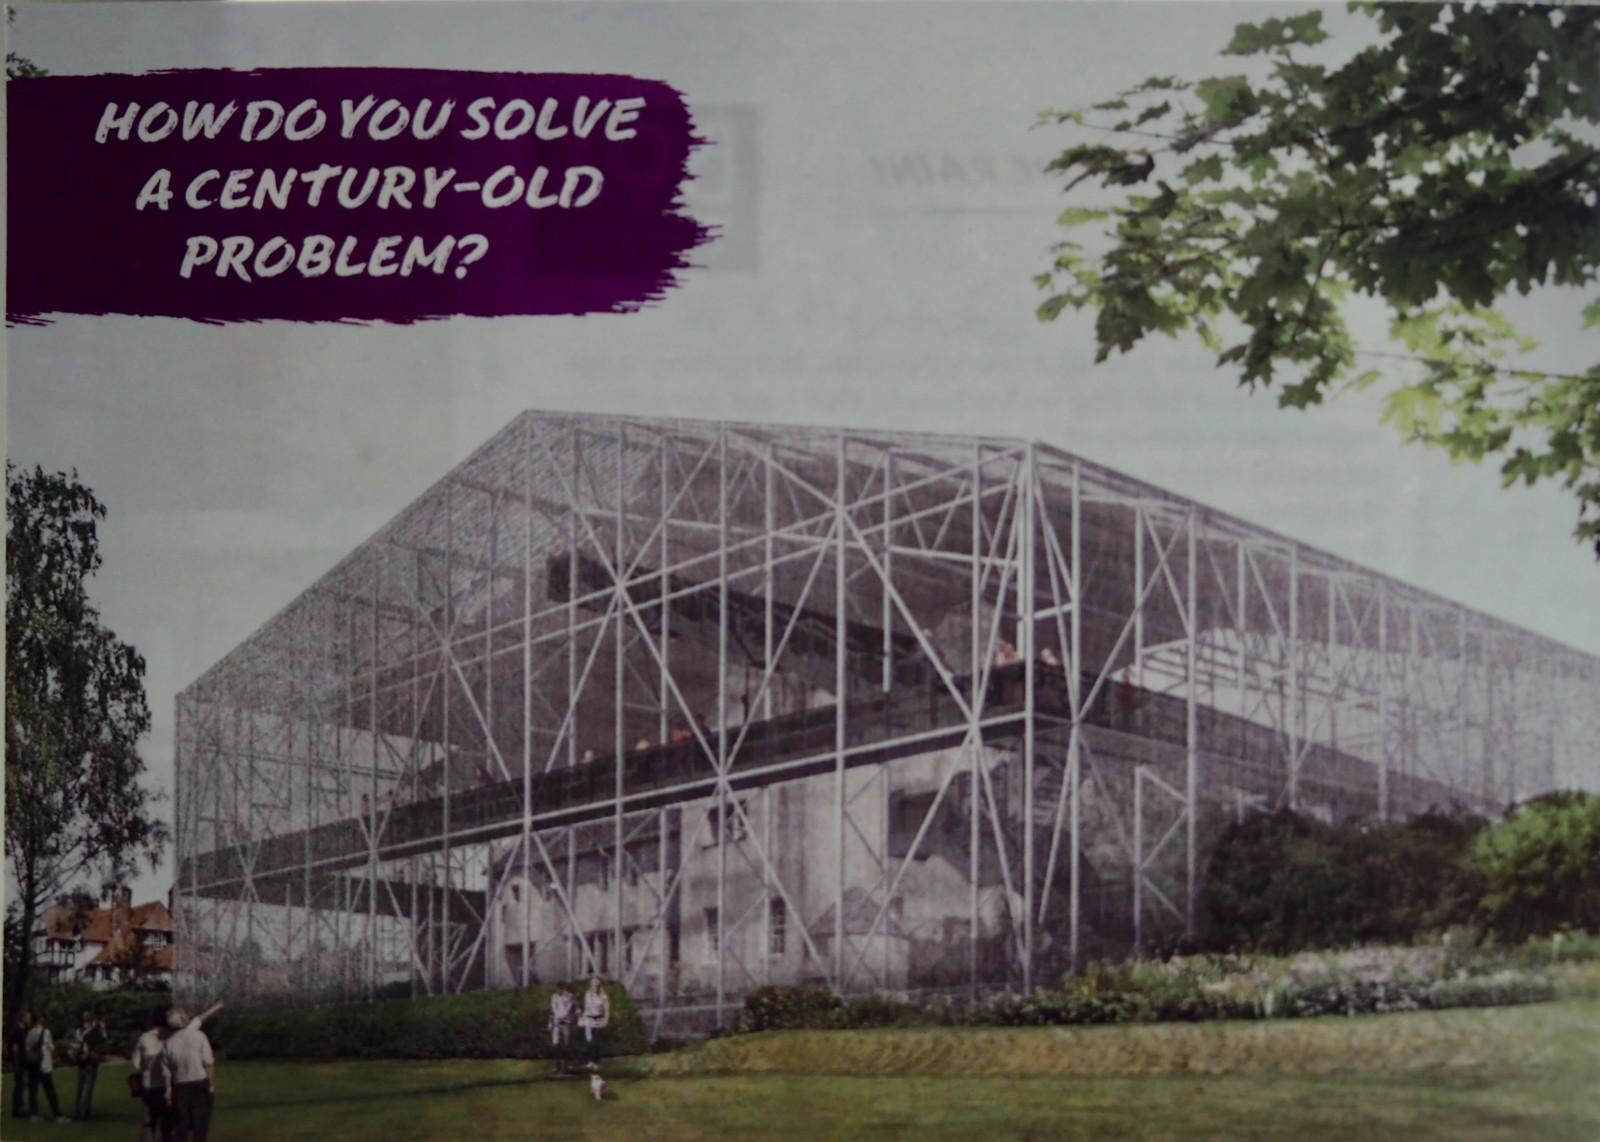 How do you solve a century old problem? © ALJJulian, Battoil.